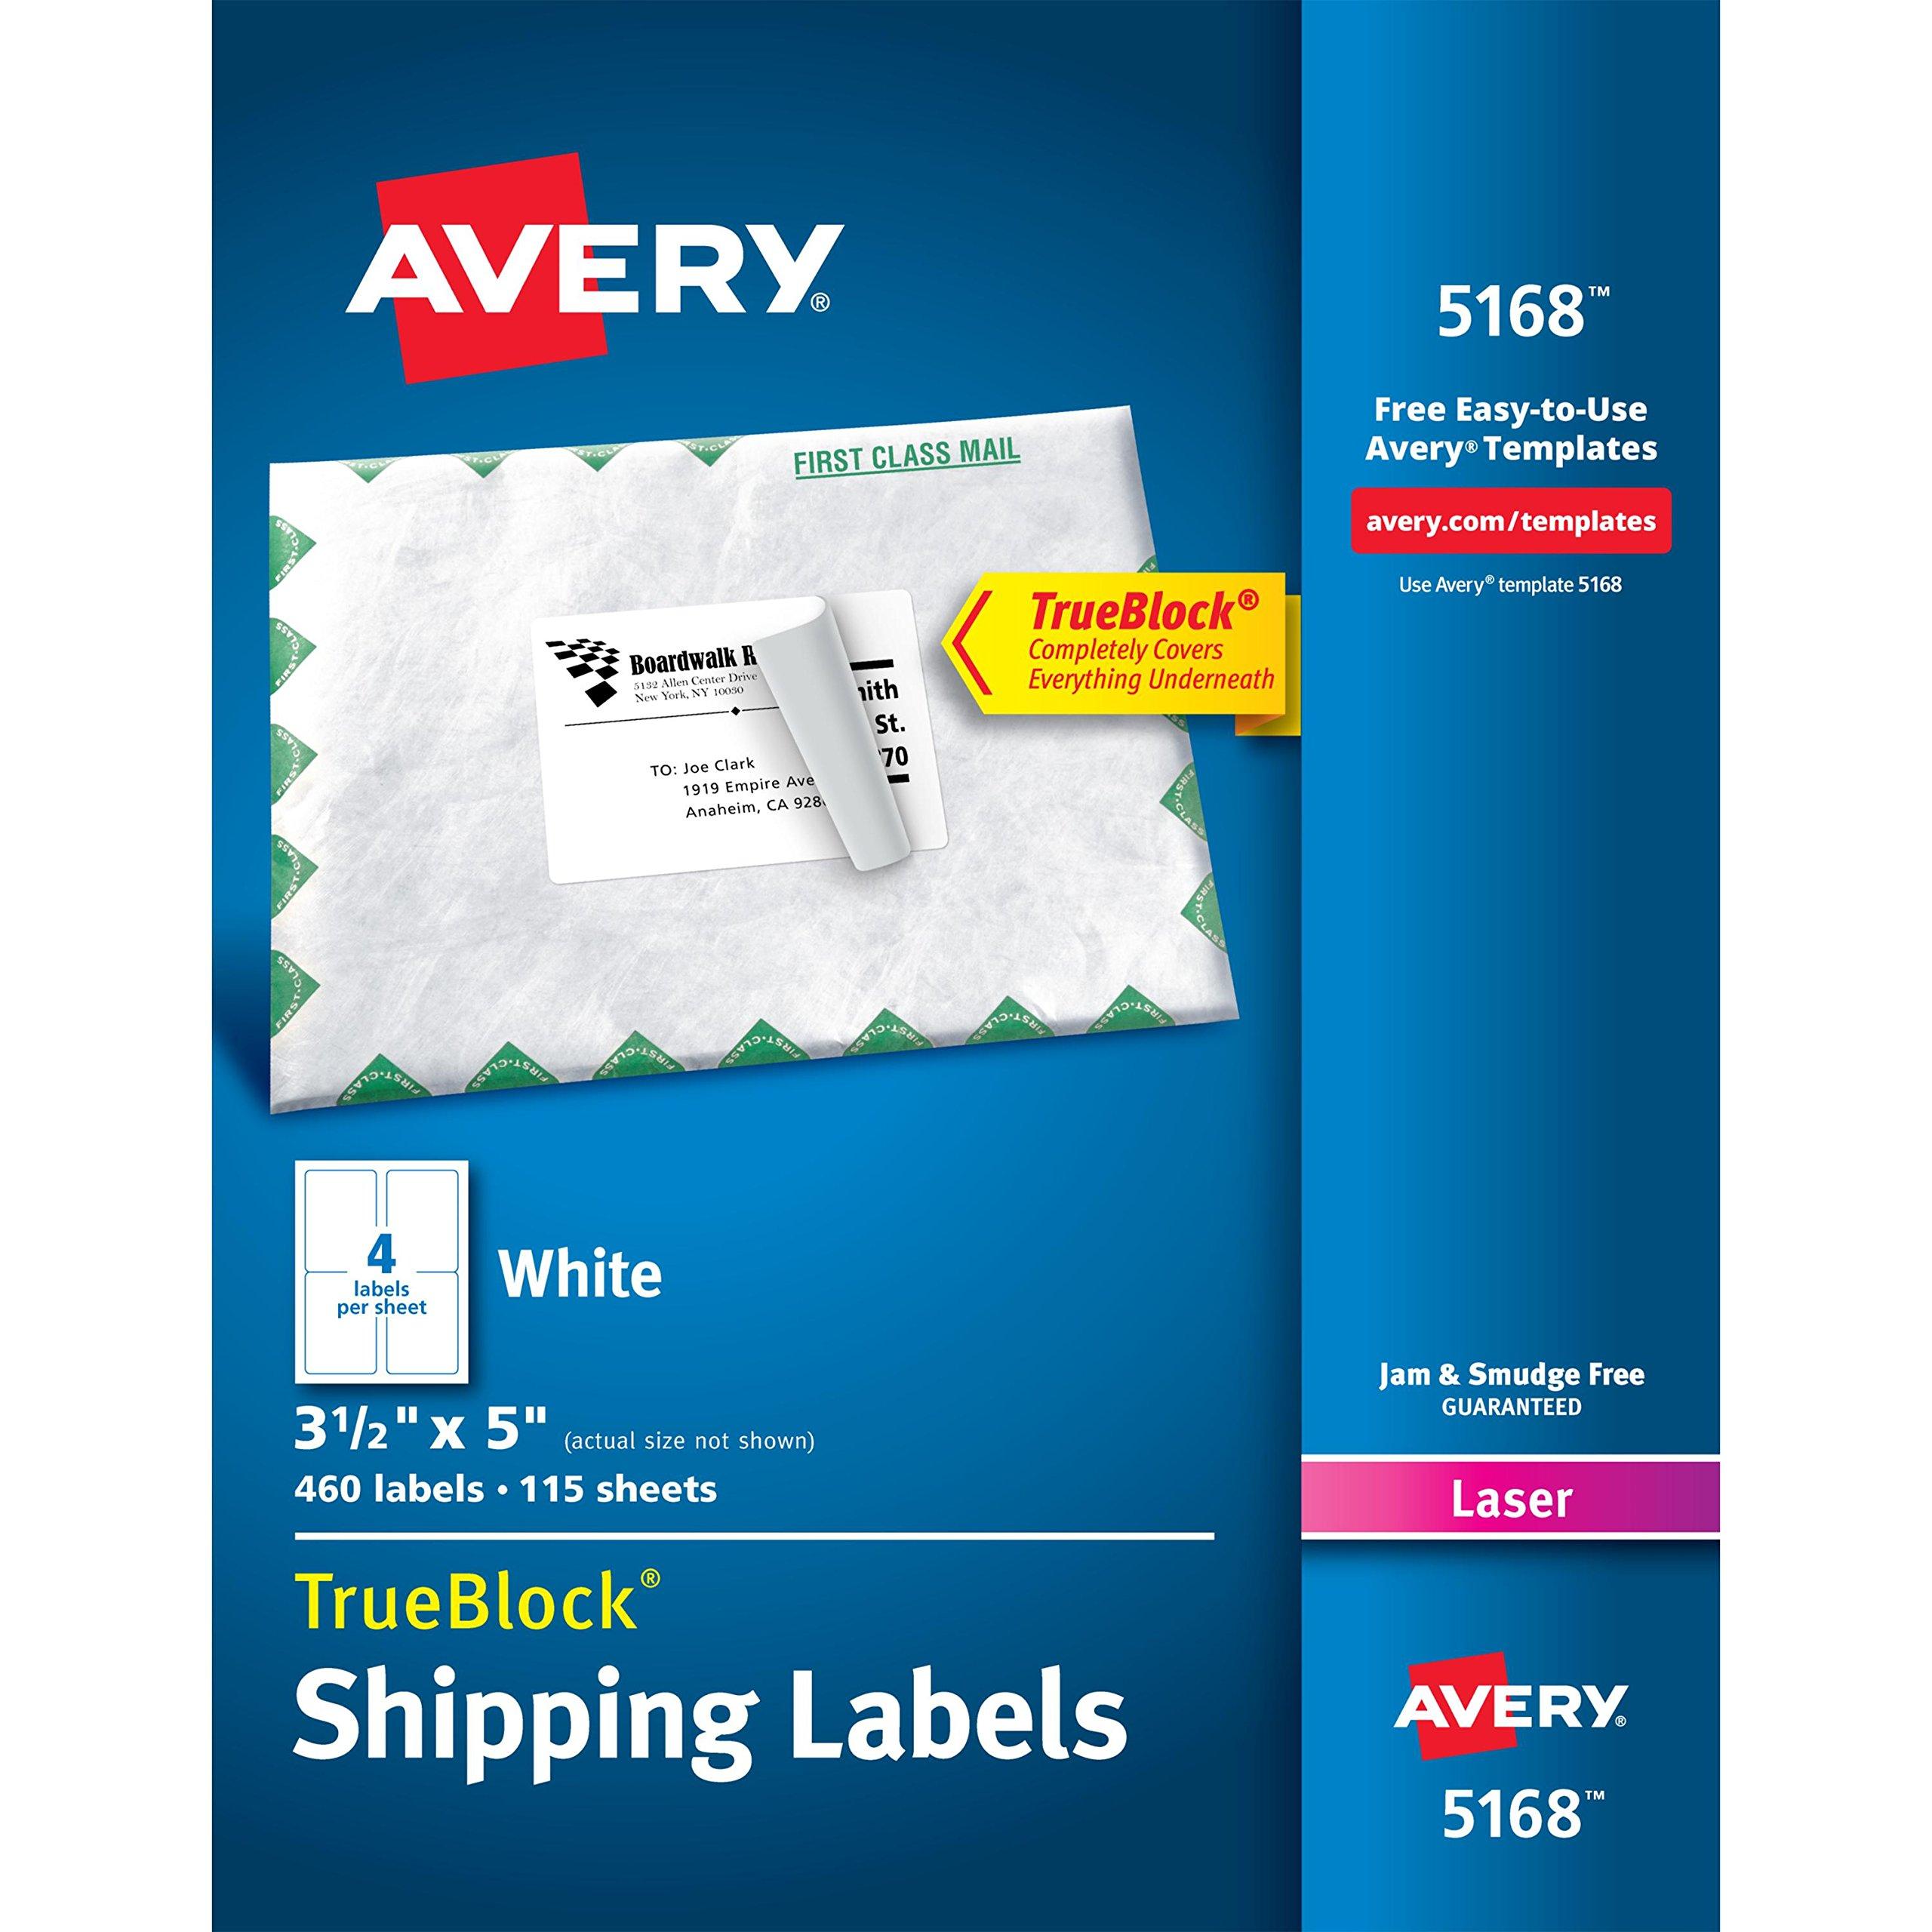 Avery Shipping Address Labels, Laser Printers, 460 Labels, 3-1/2 x 5, Permanent Adhesive, TrueBlock (5168)